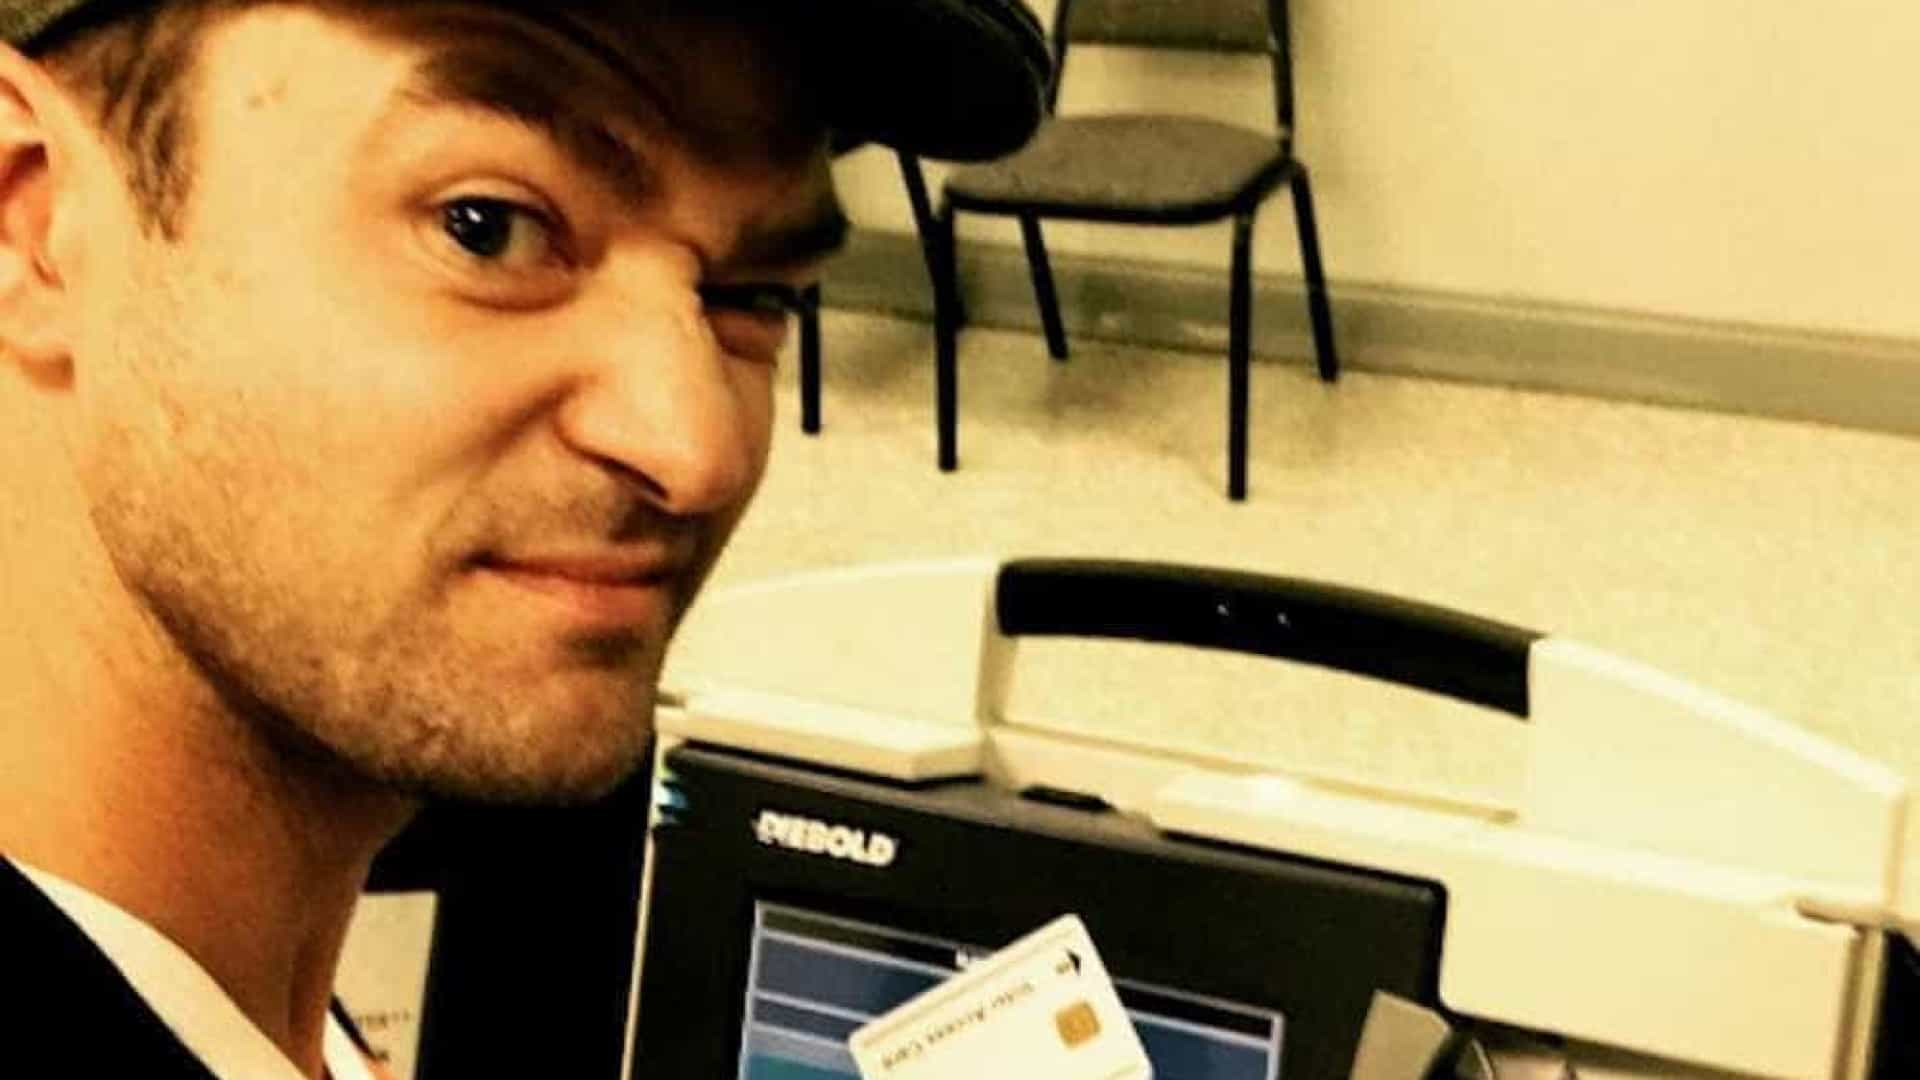 Justin Timberlake é investigado após postar selfie durante voto